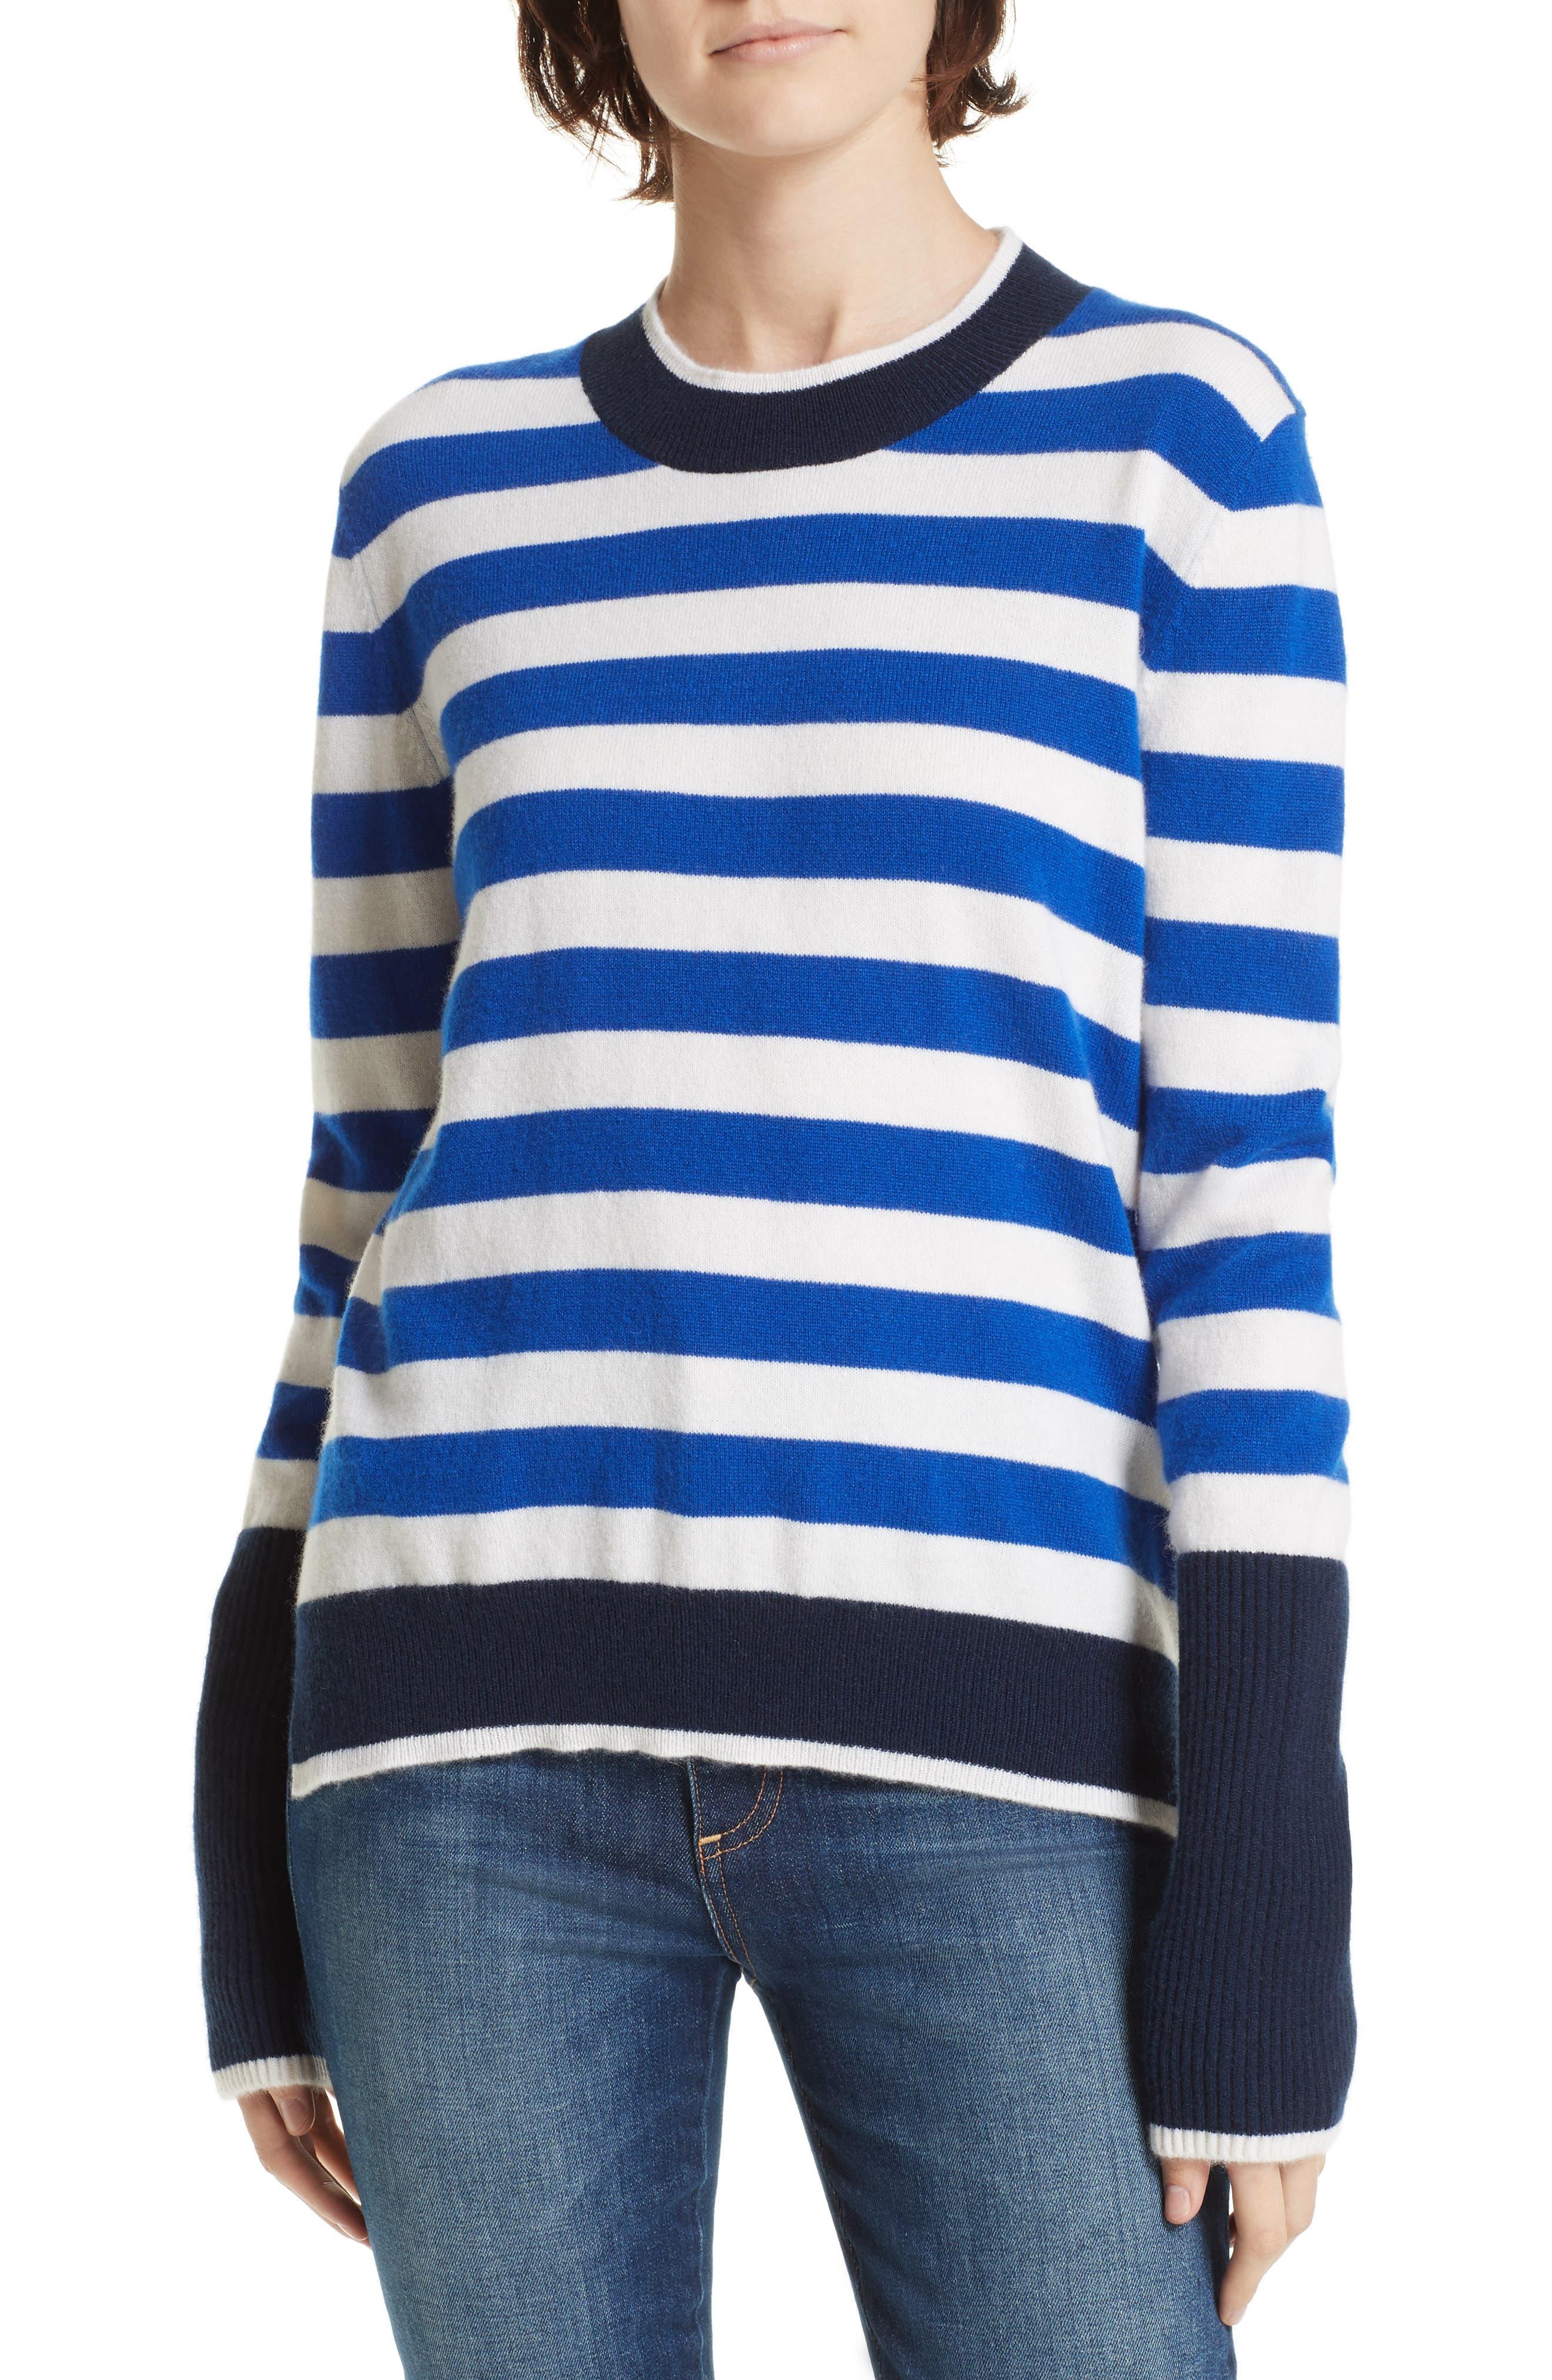 L'Universite Cashmere Sweater,                             Main thumbnail 1, color,                             BRIGHT BLUE/ CREAM/ NAVY